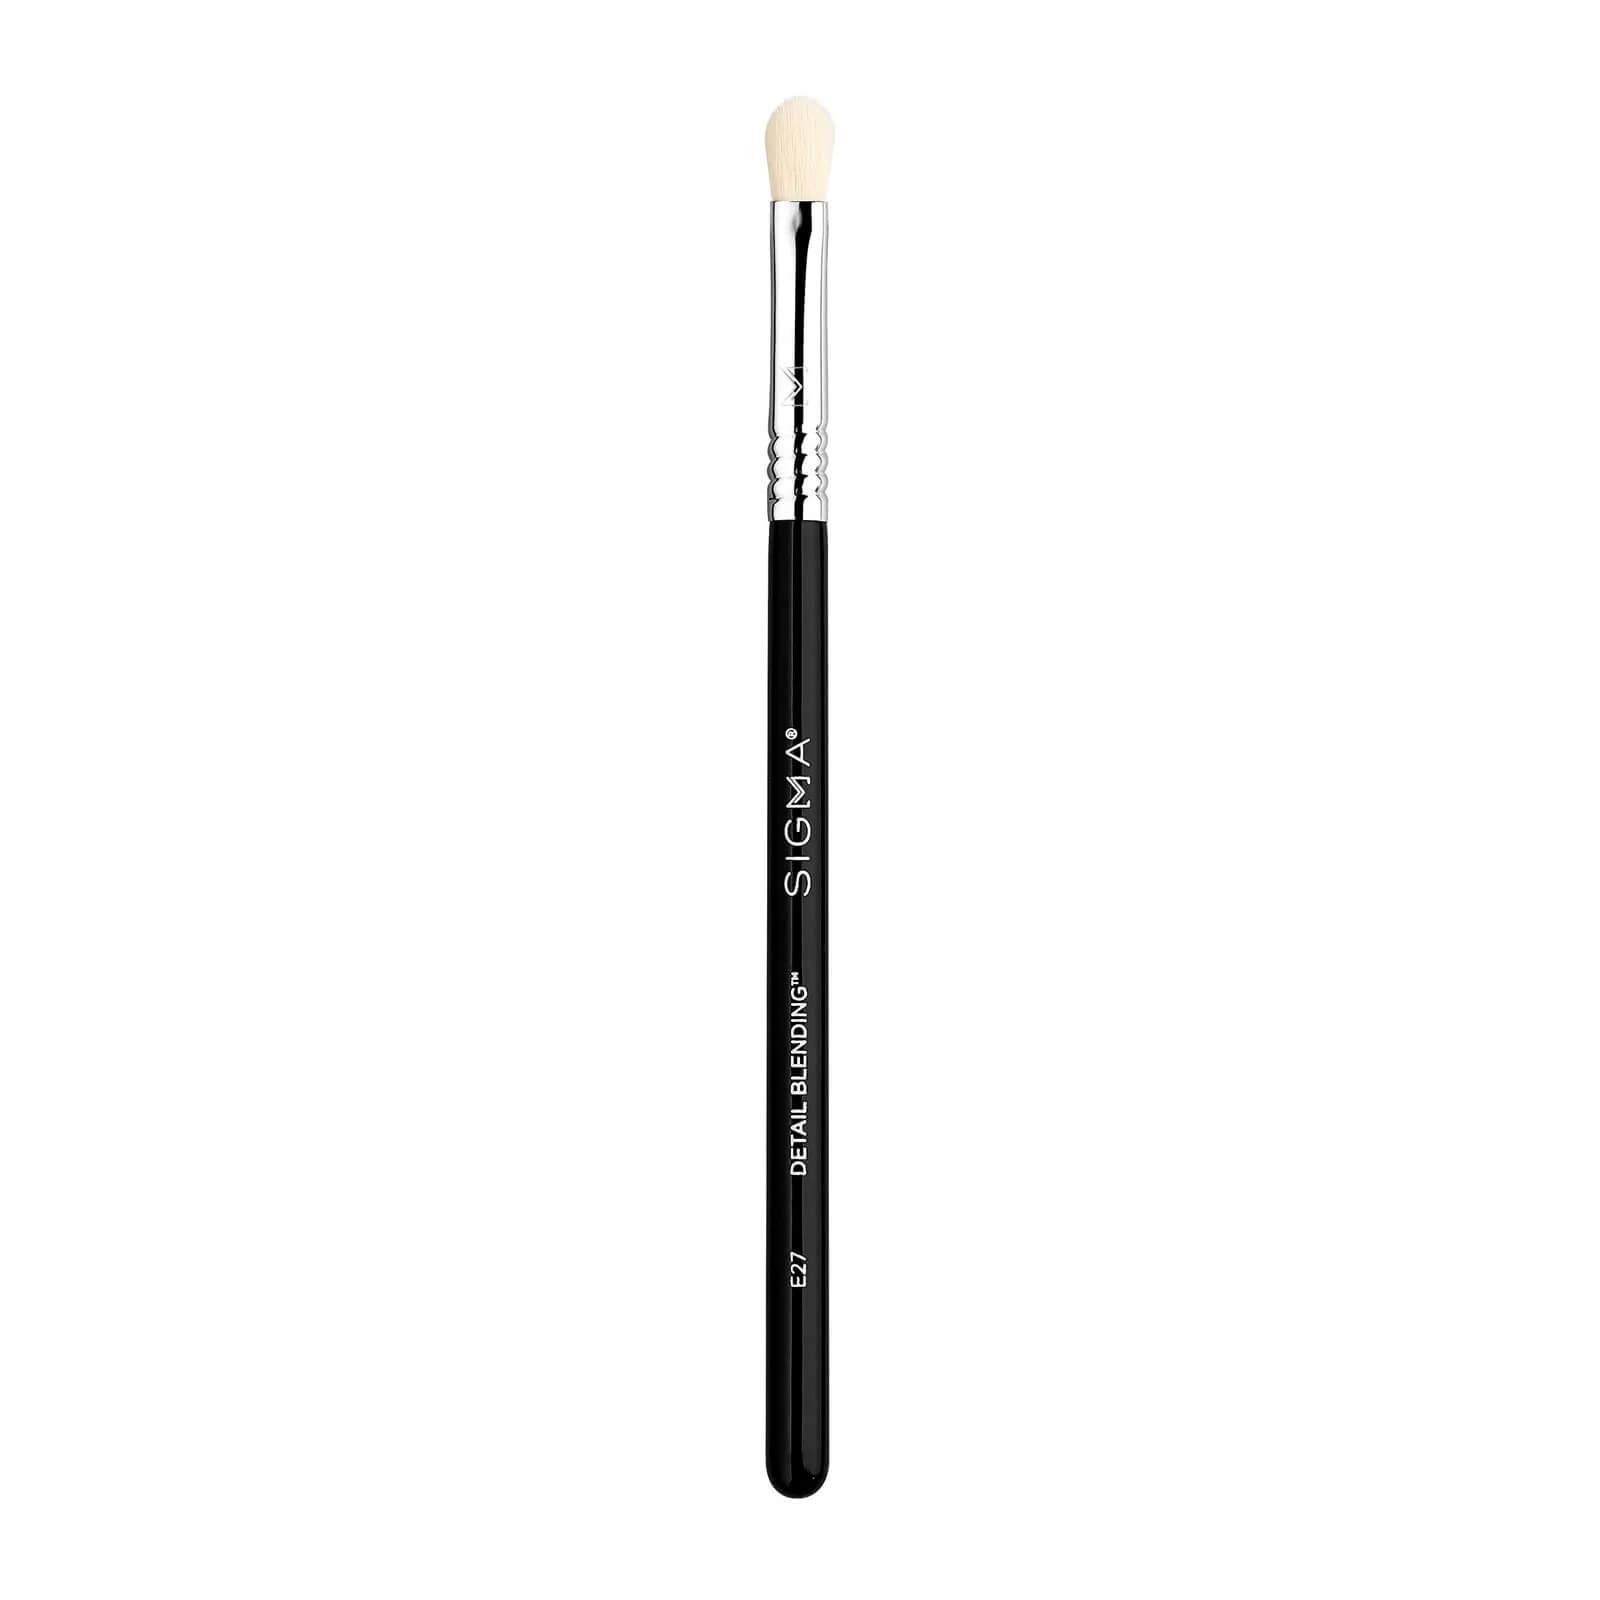 Купить Sigma Beauty E27 Detail Blending Brush